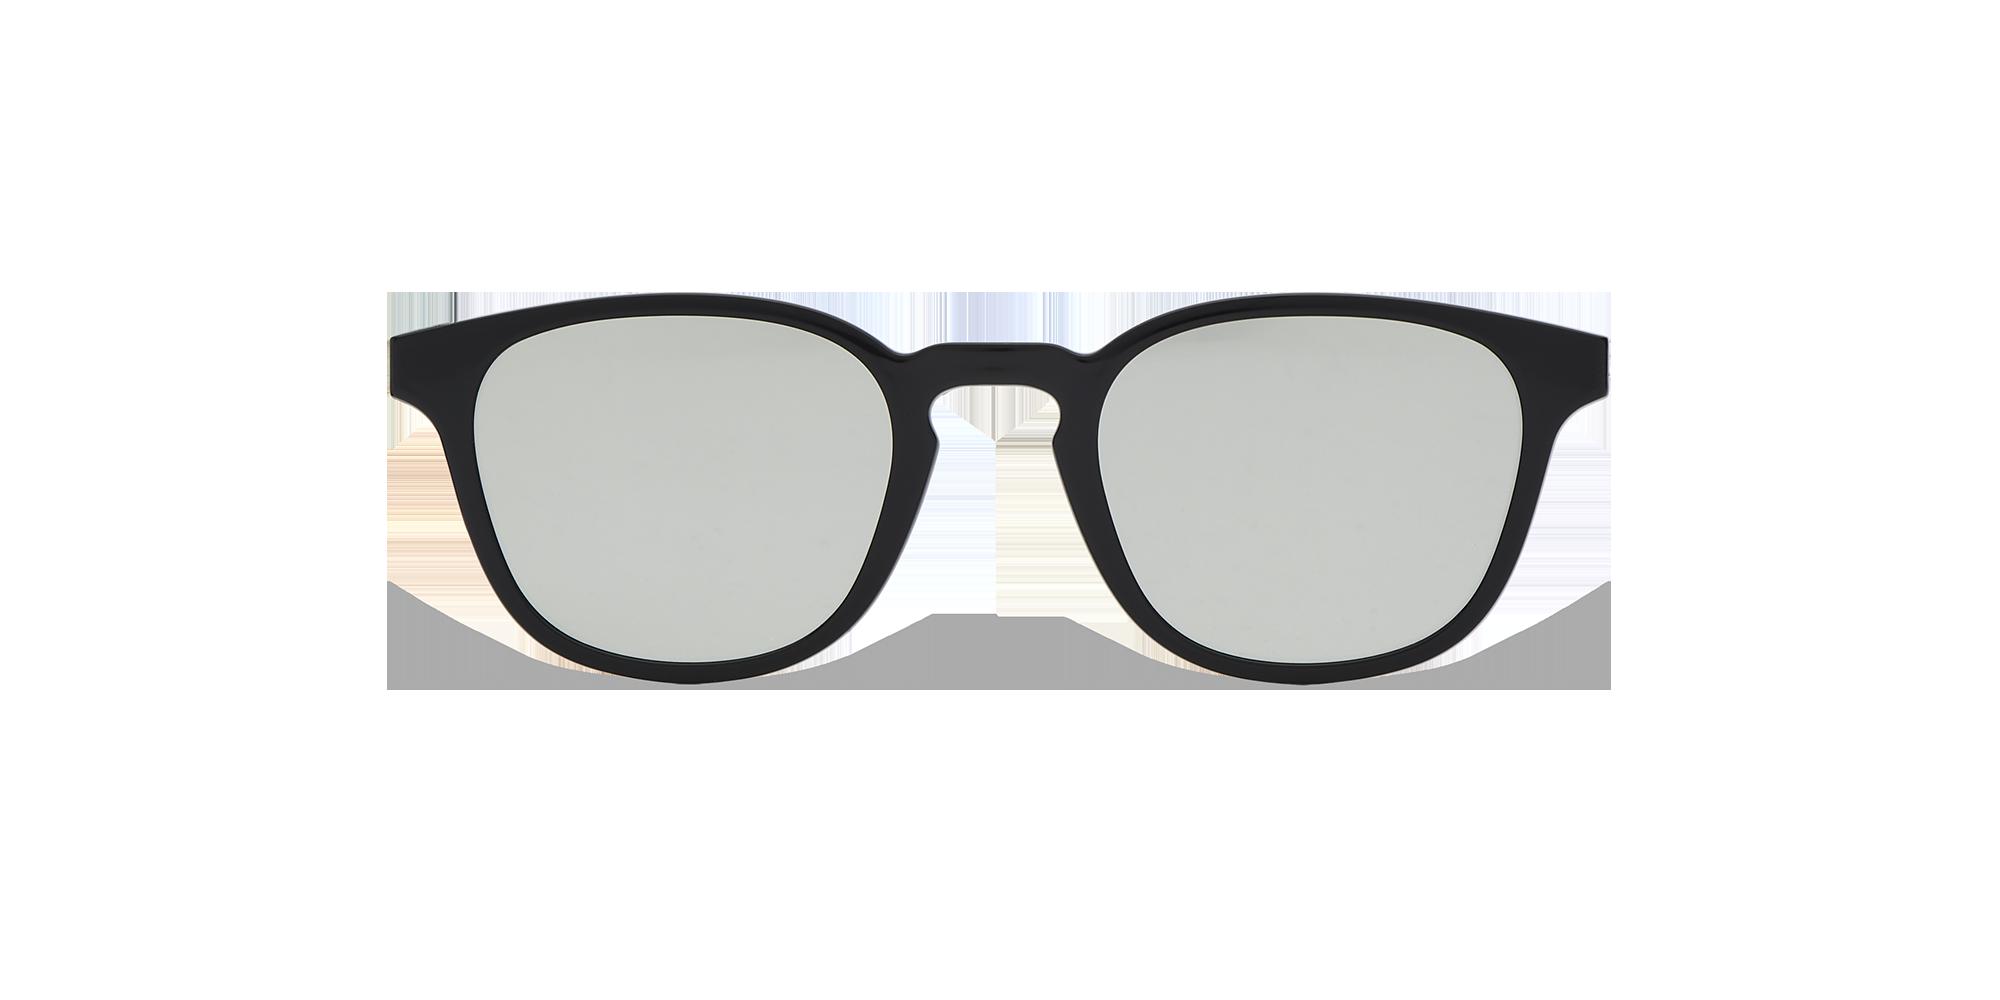 afflelou/france/products/smart_clip/clips_glasses/07630036429310_face.png